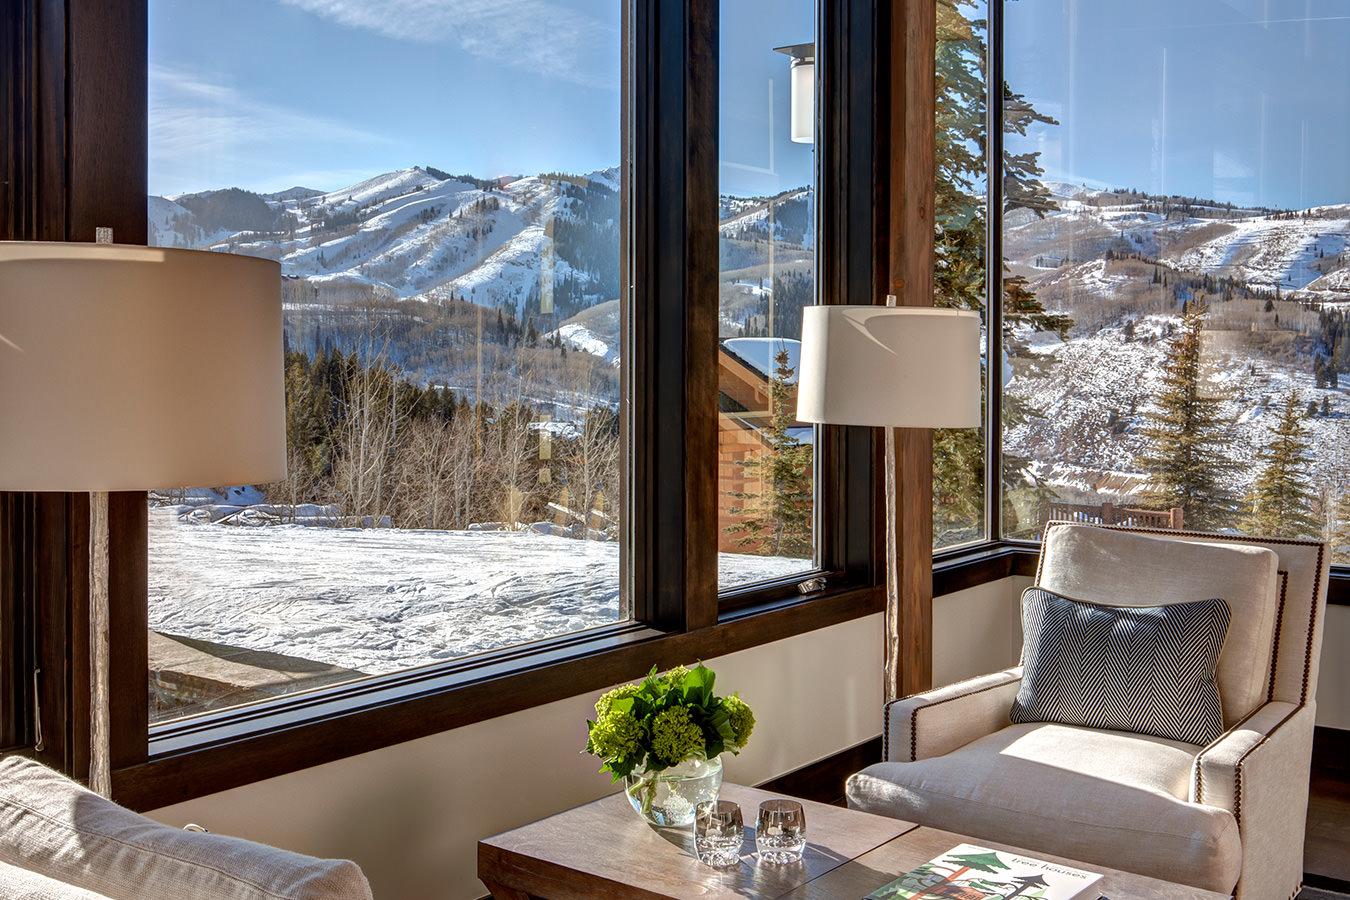 Luxury Park City rental reading nook overlooking ski runs at Deer Valley Resort